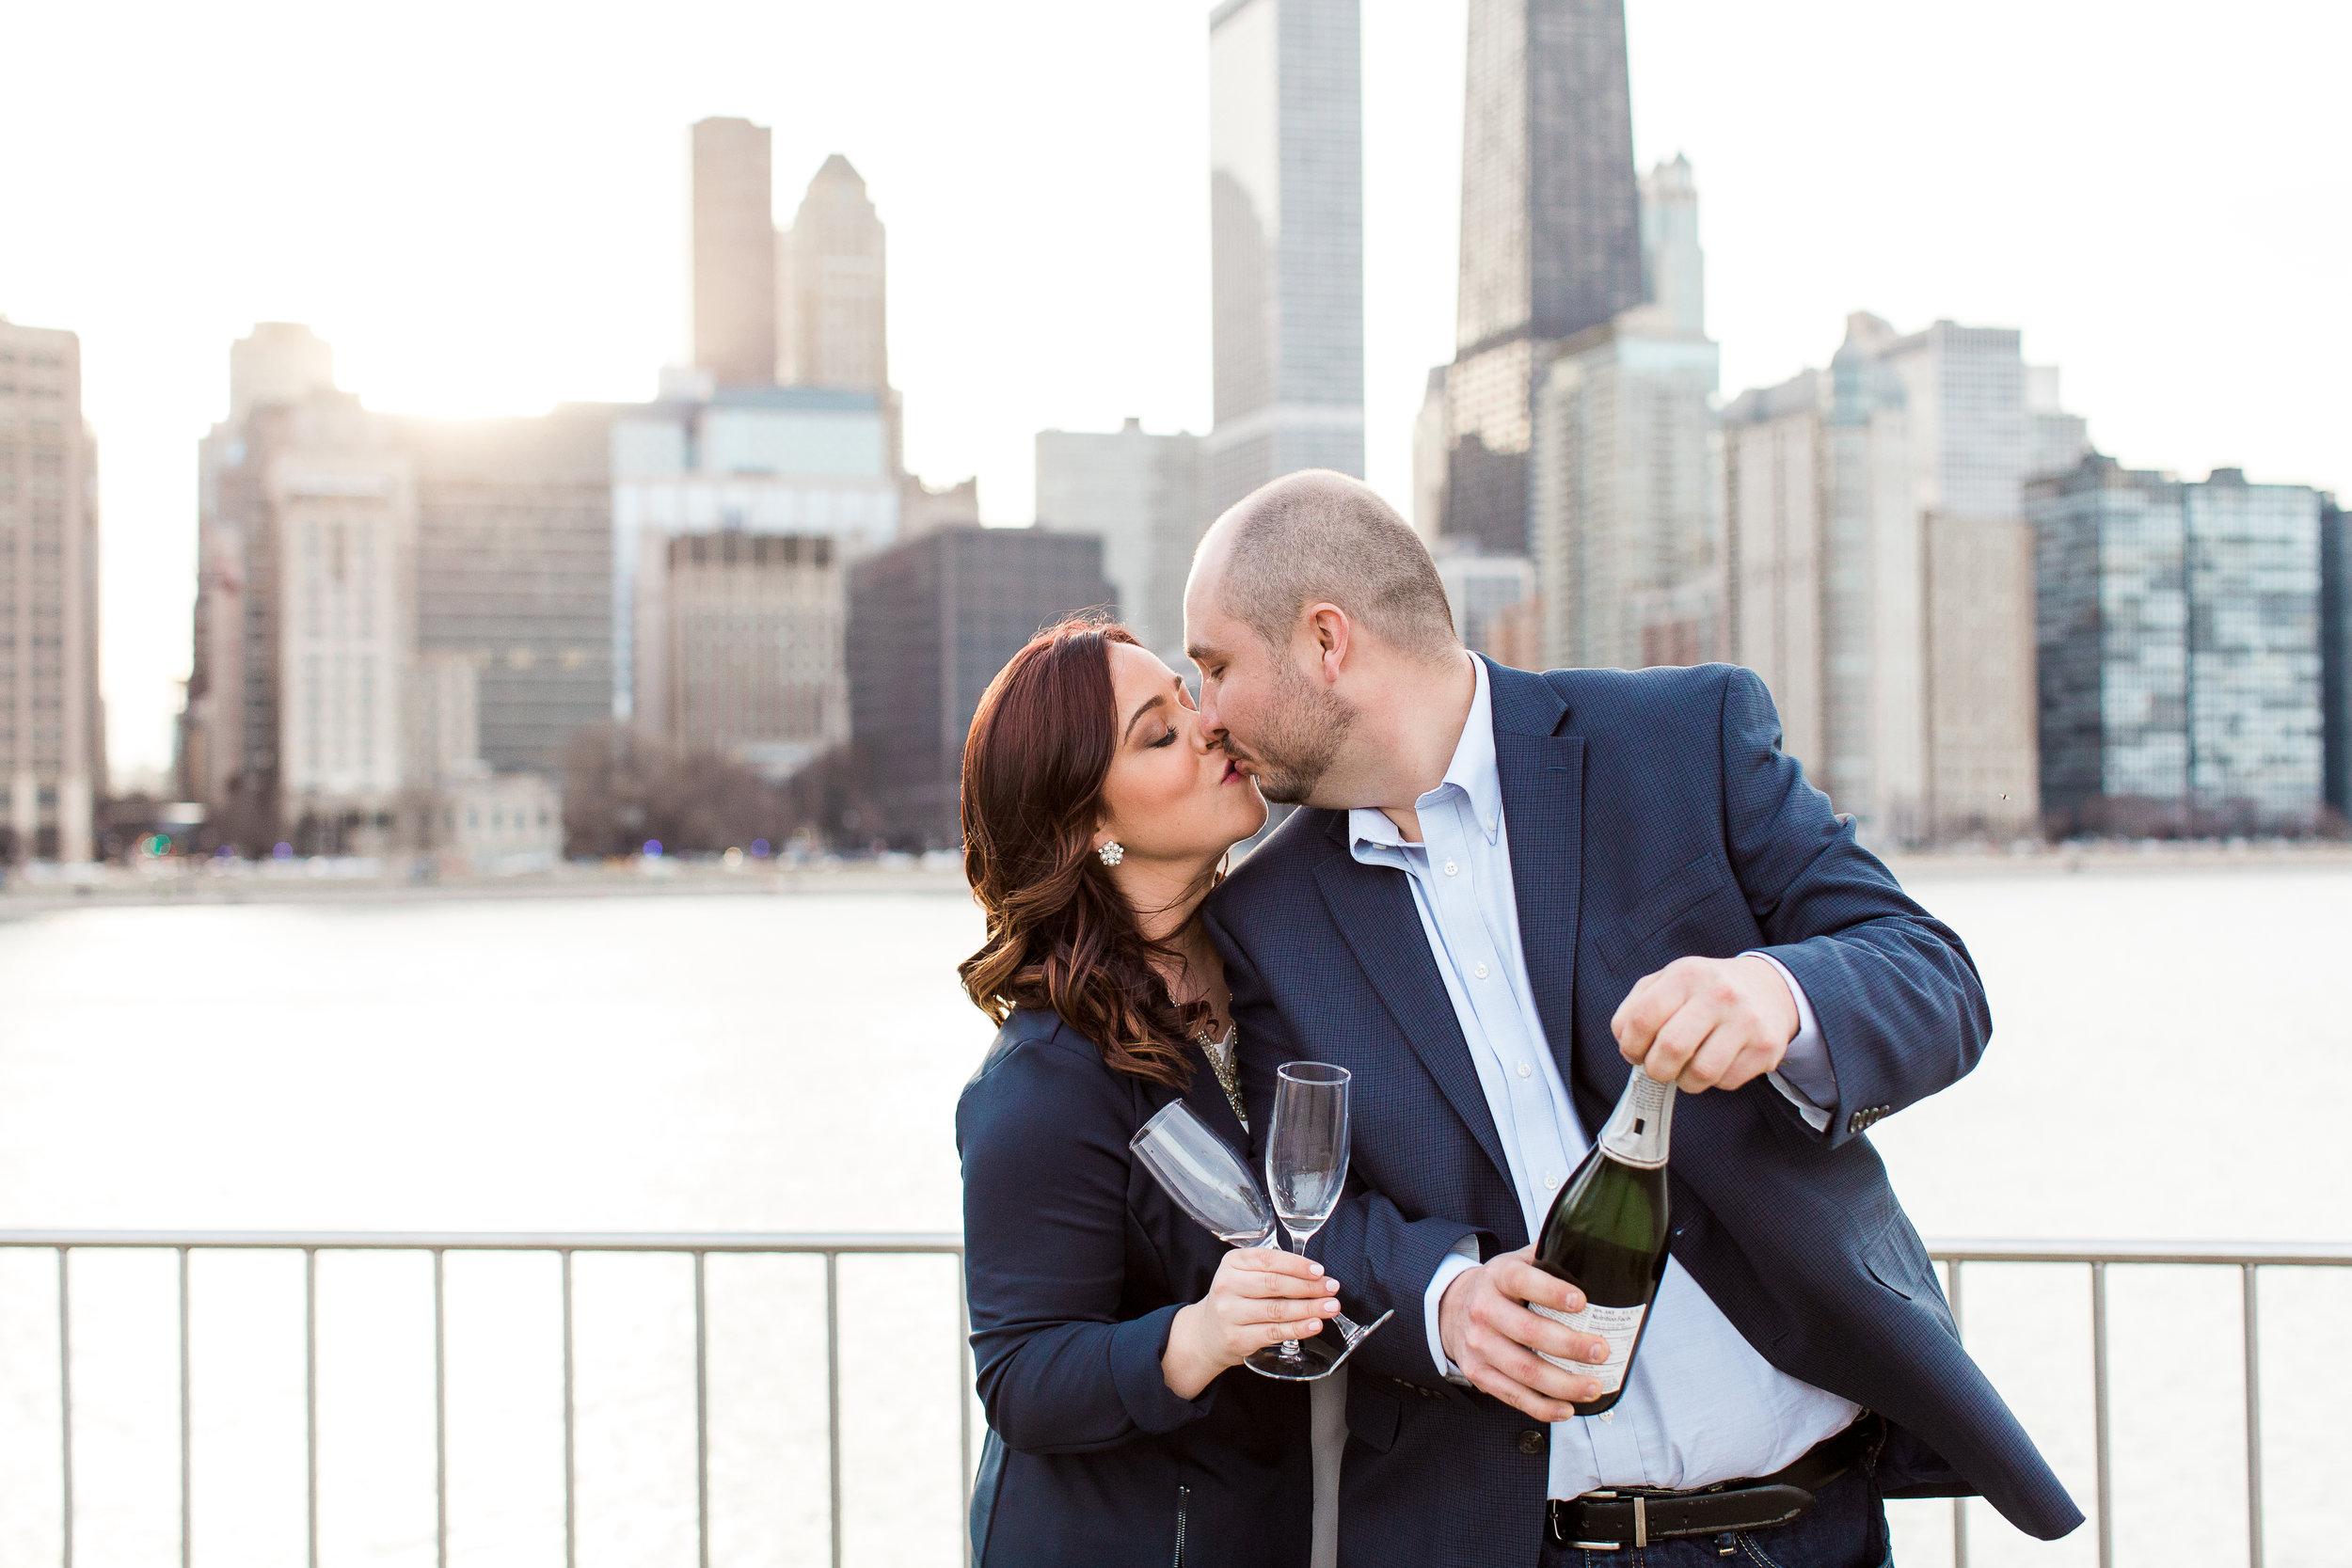 chicago-engagement-photographer-classy-olive-park-downtown-wedding-kristen-cloyd-90.jpg